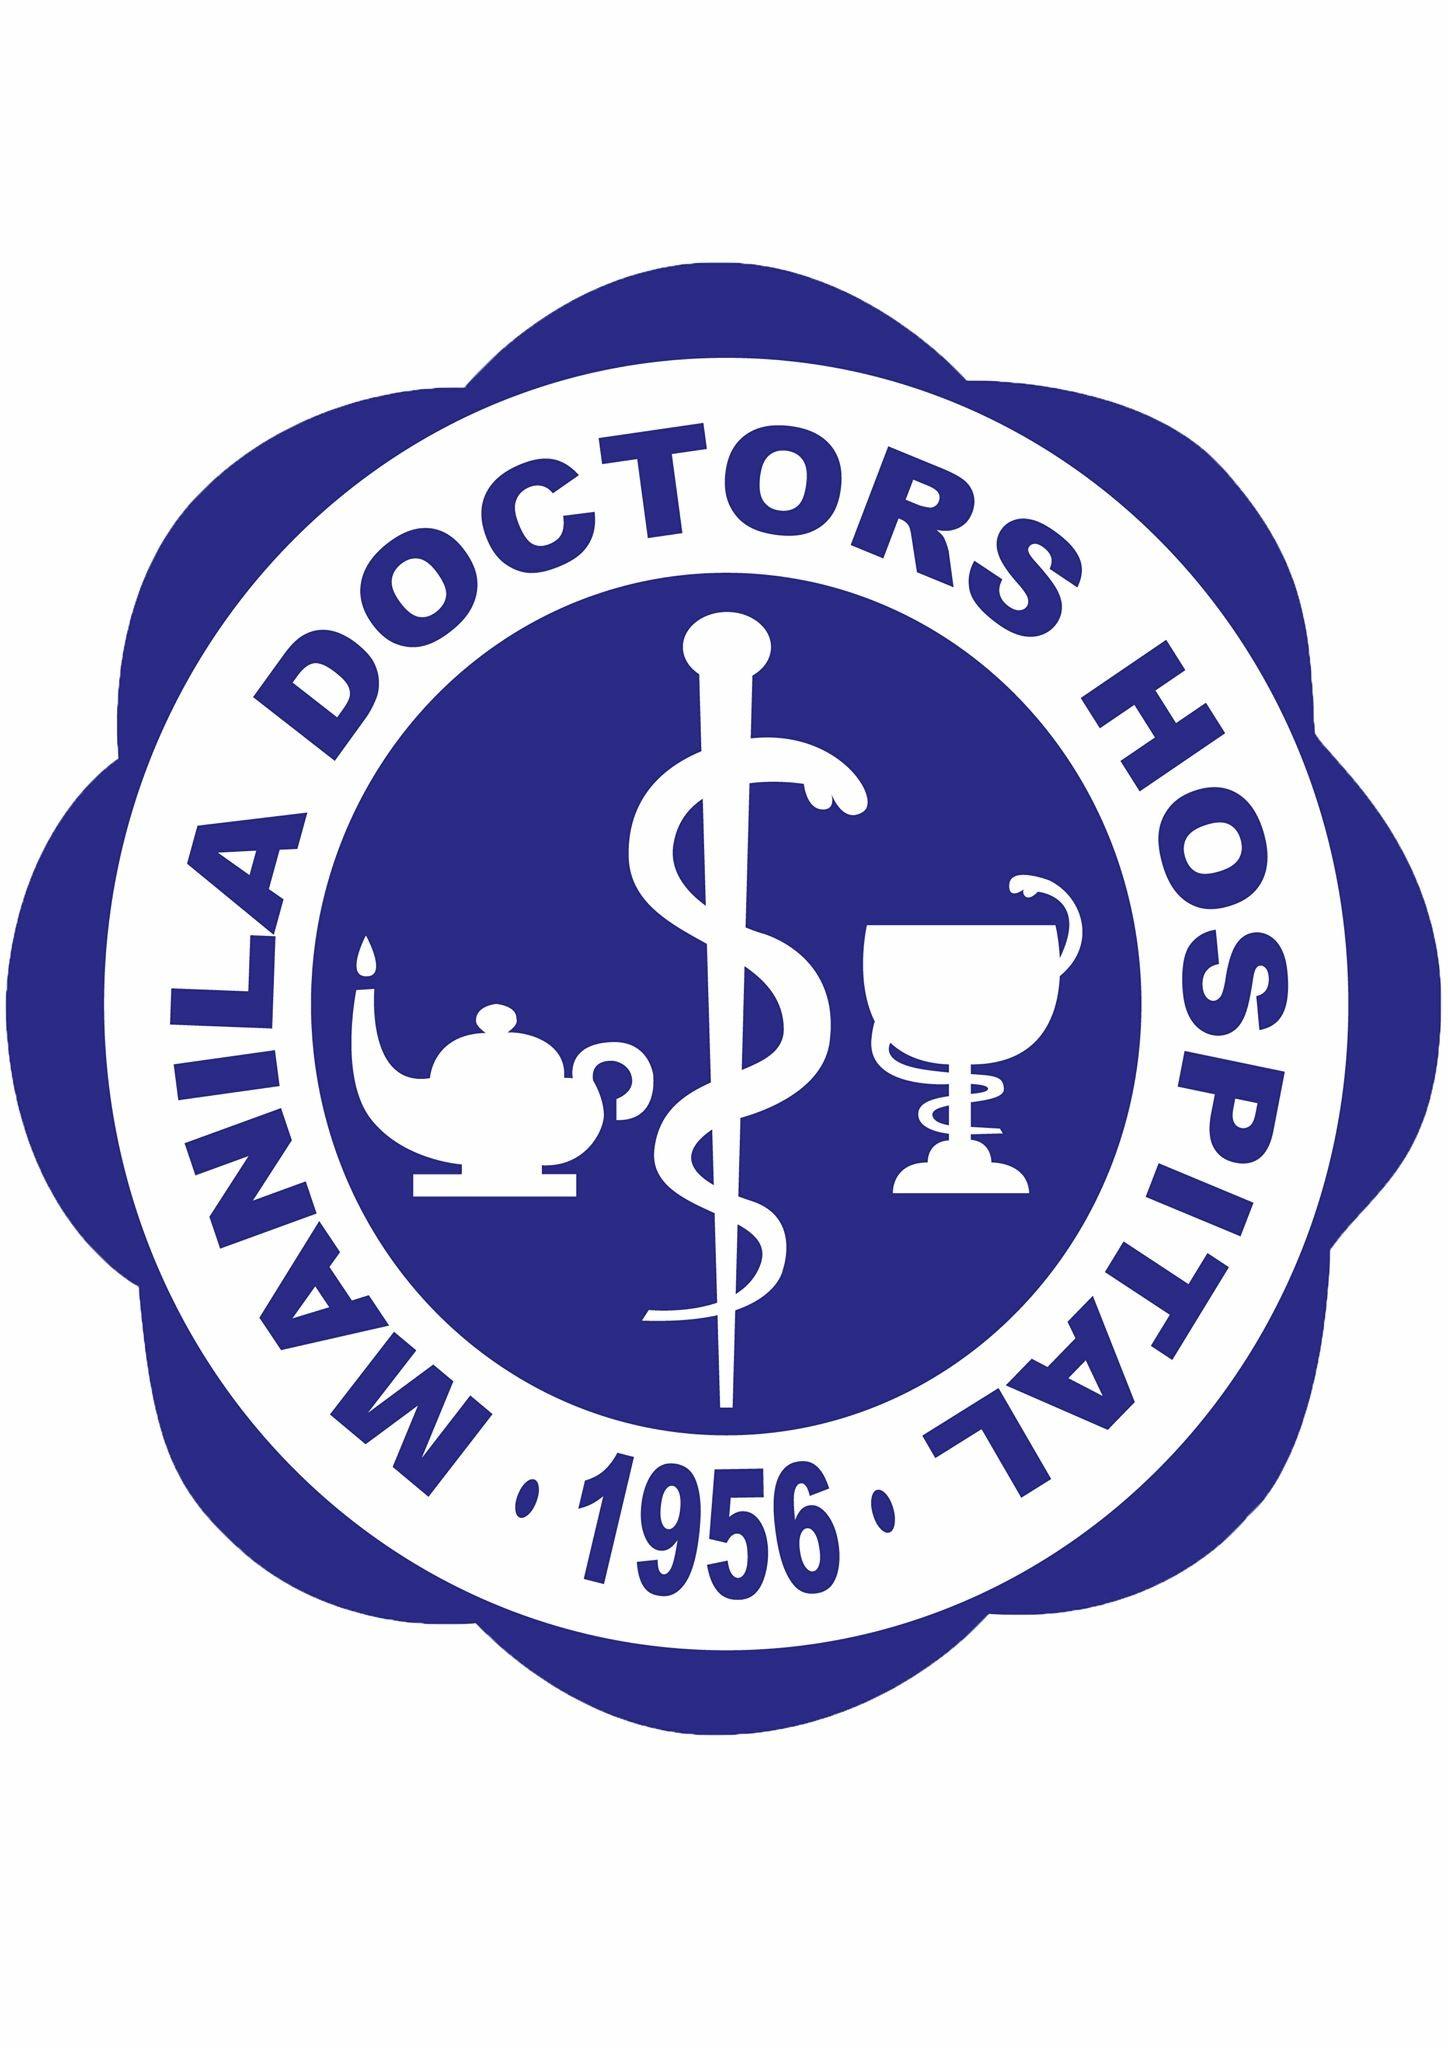 Manila Doctors Hospital - Room No. 219